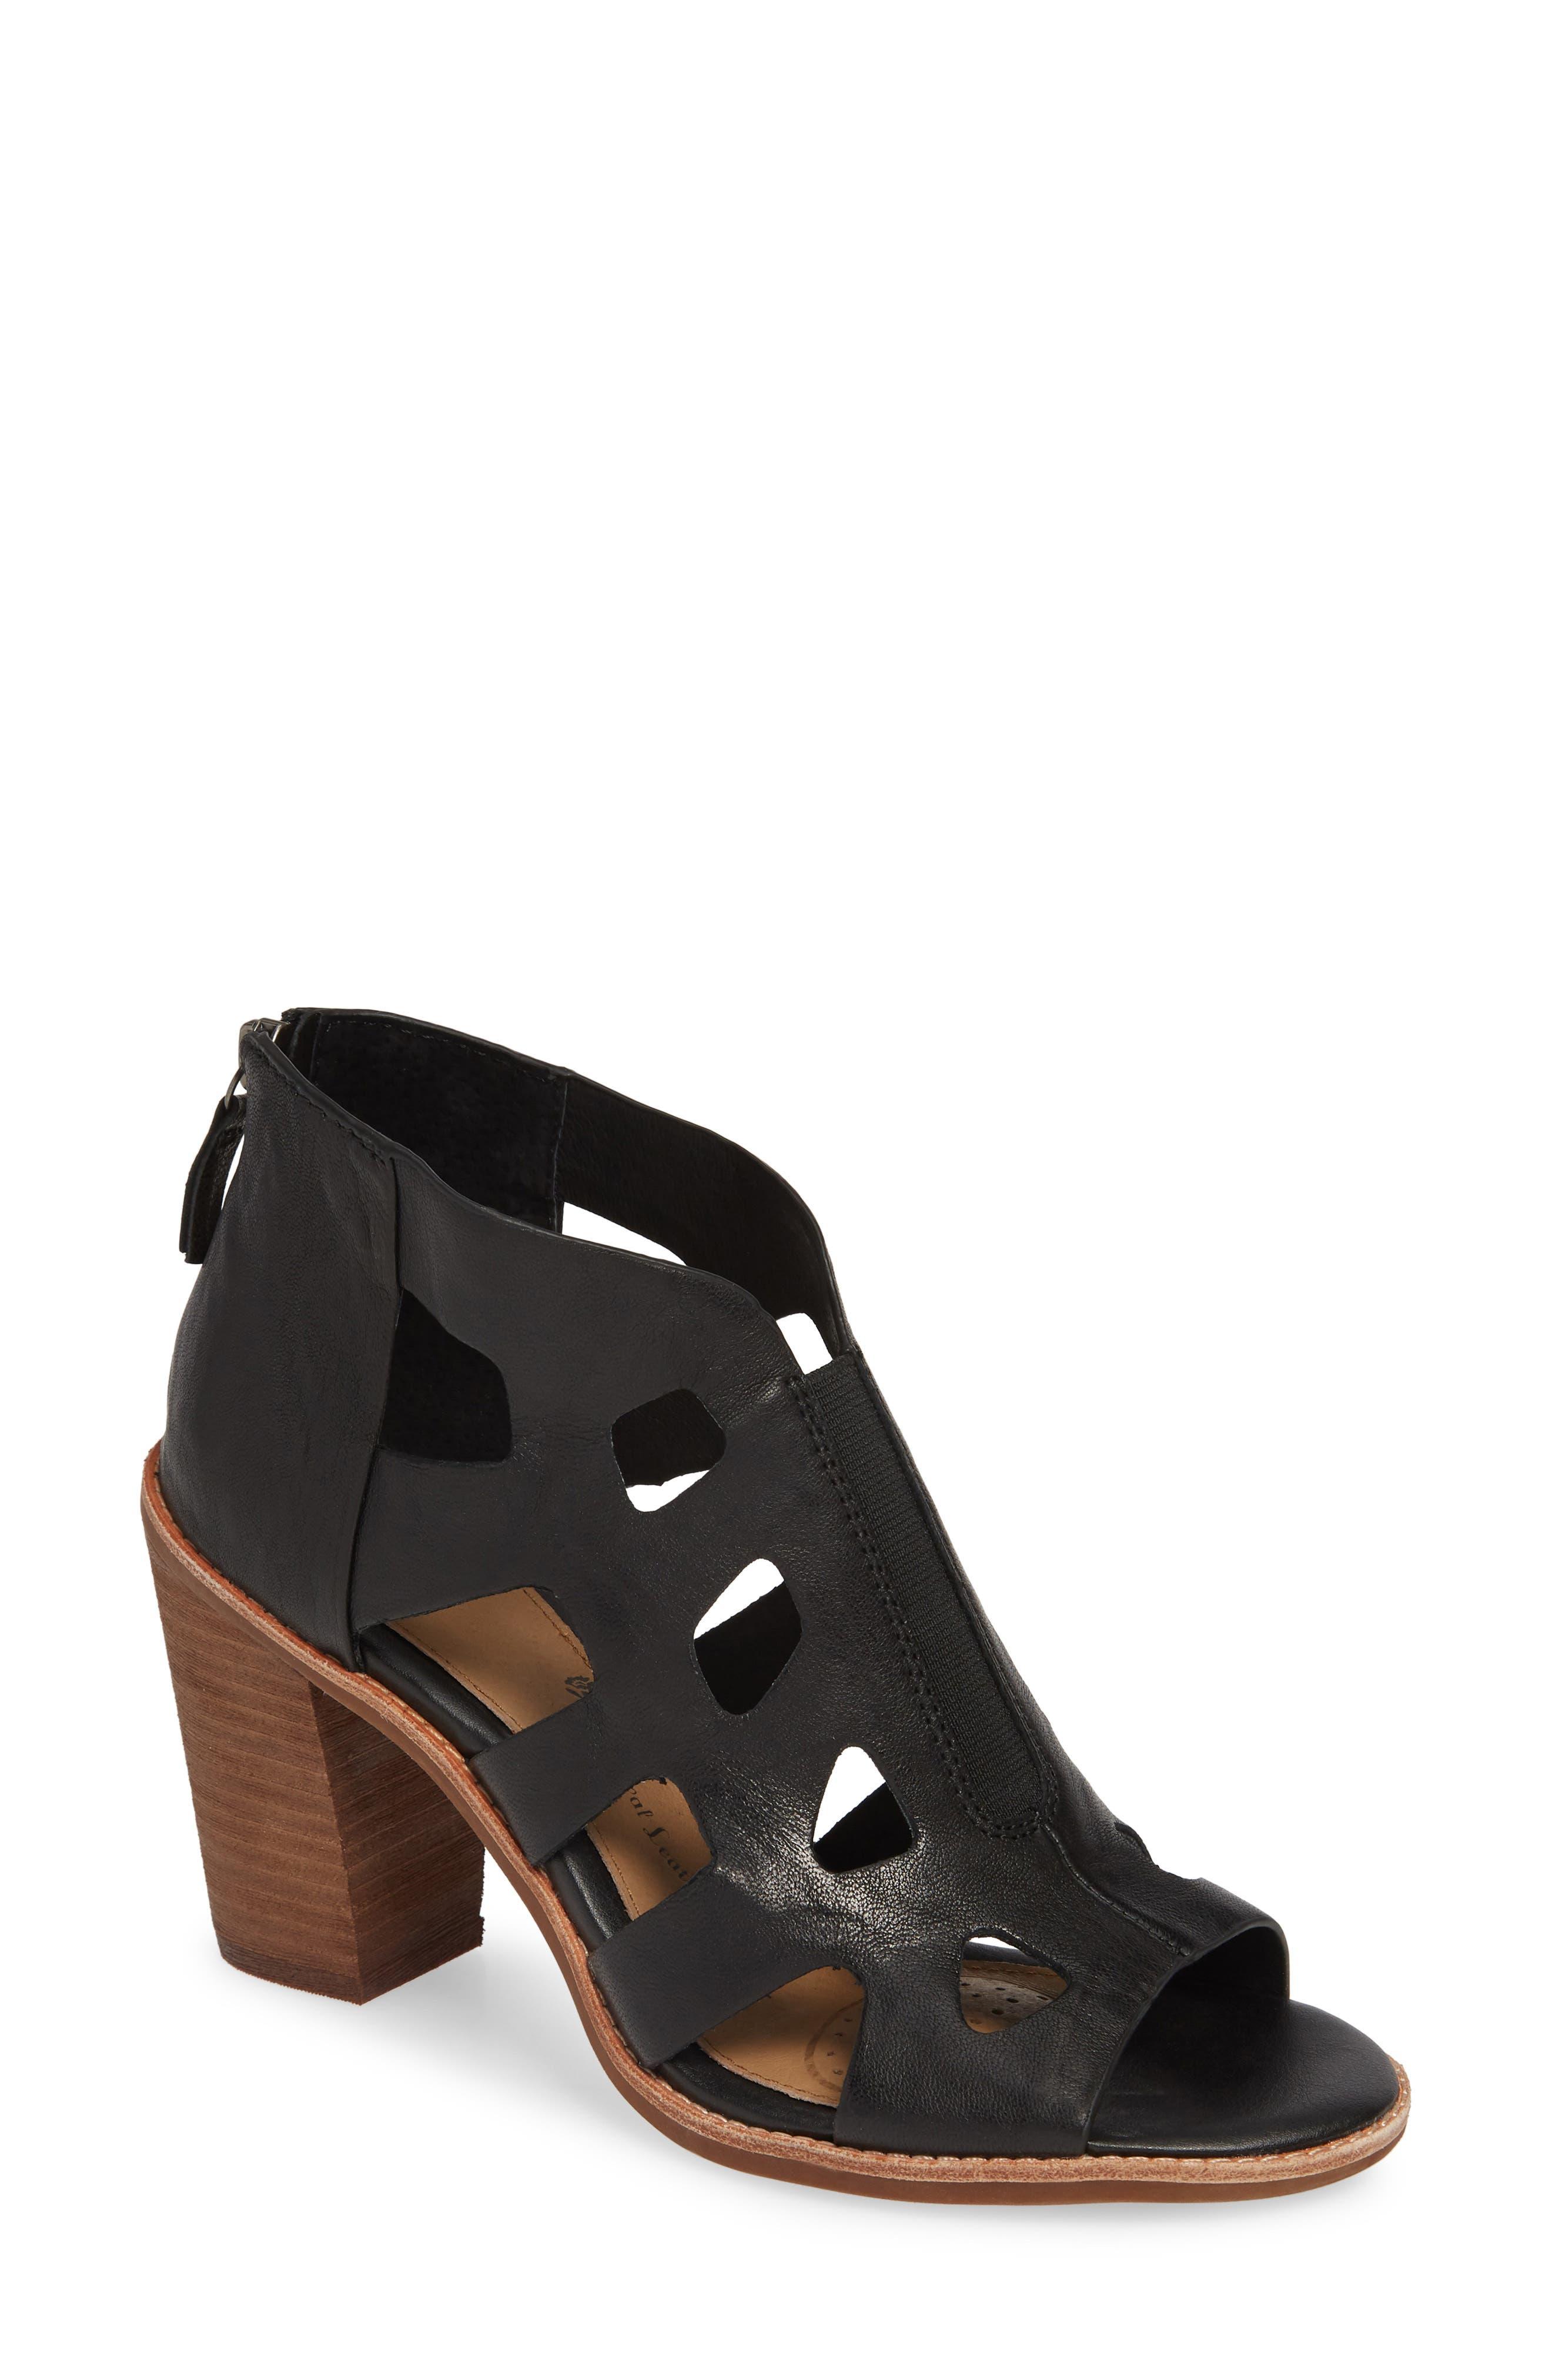 Pazia Block Heel Sandal, Main, color, BLACK LEATHER